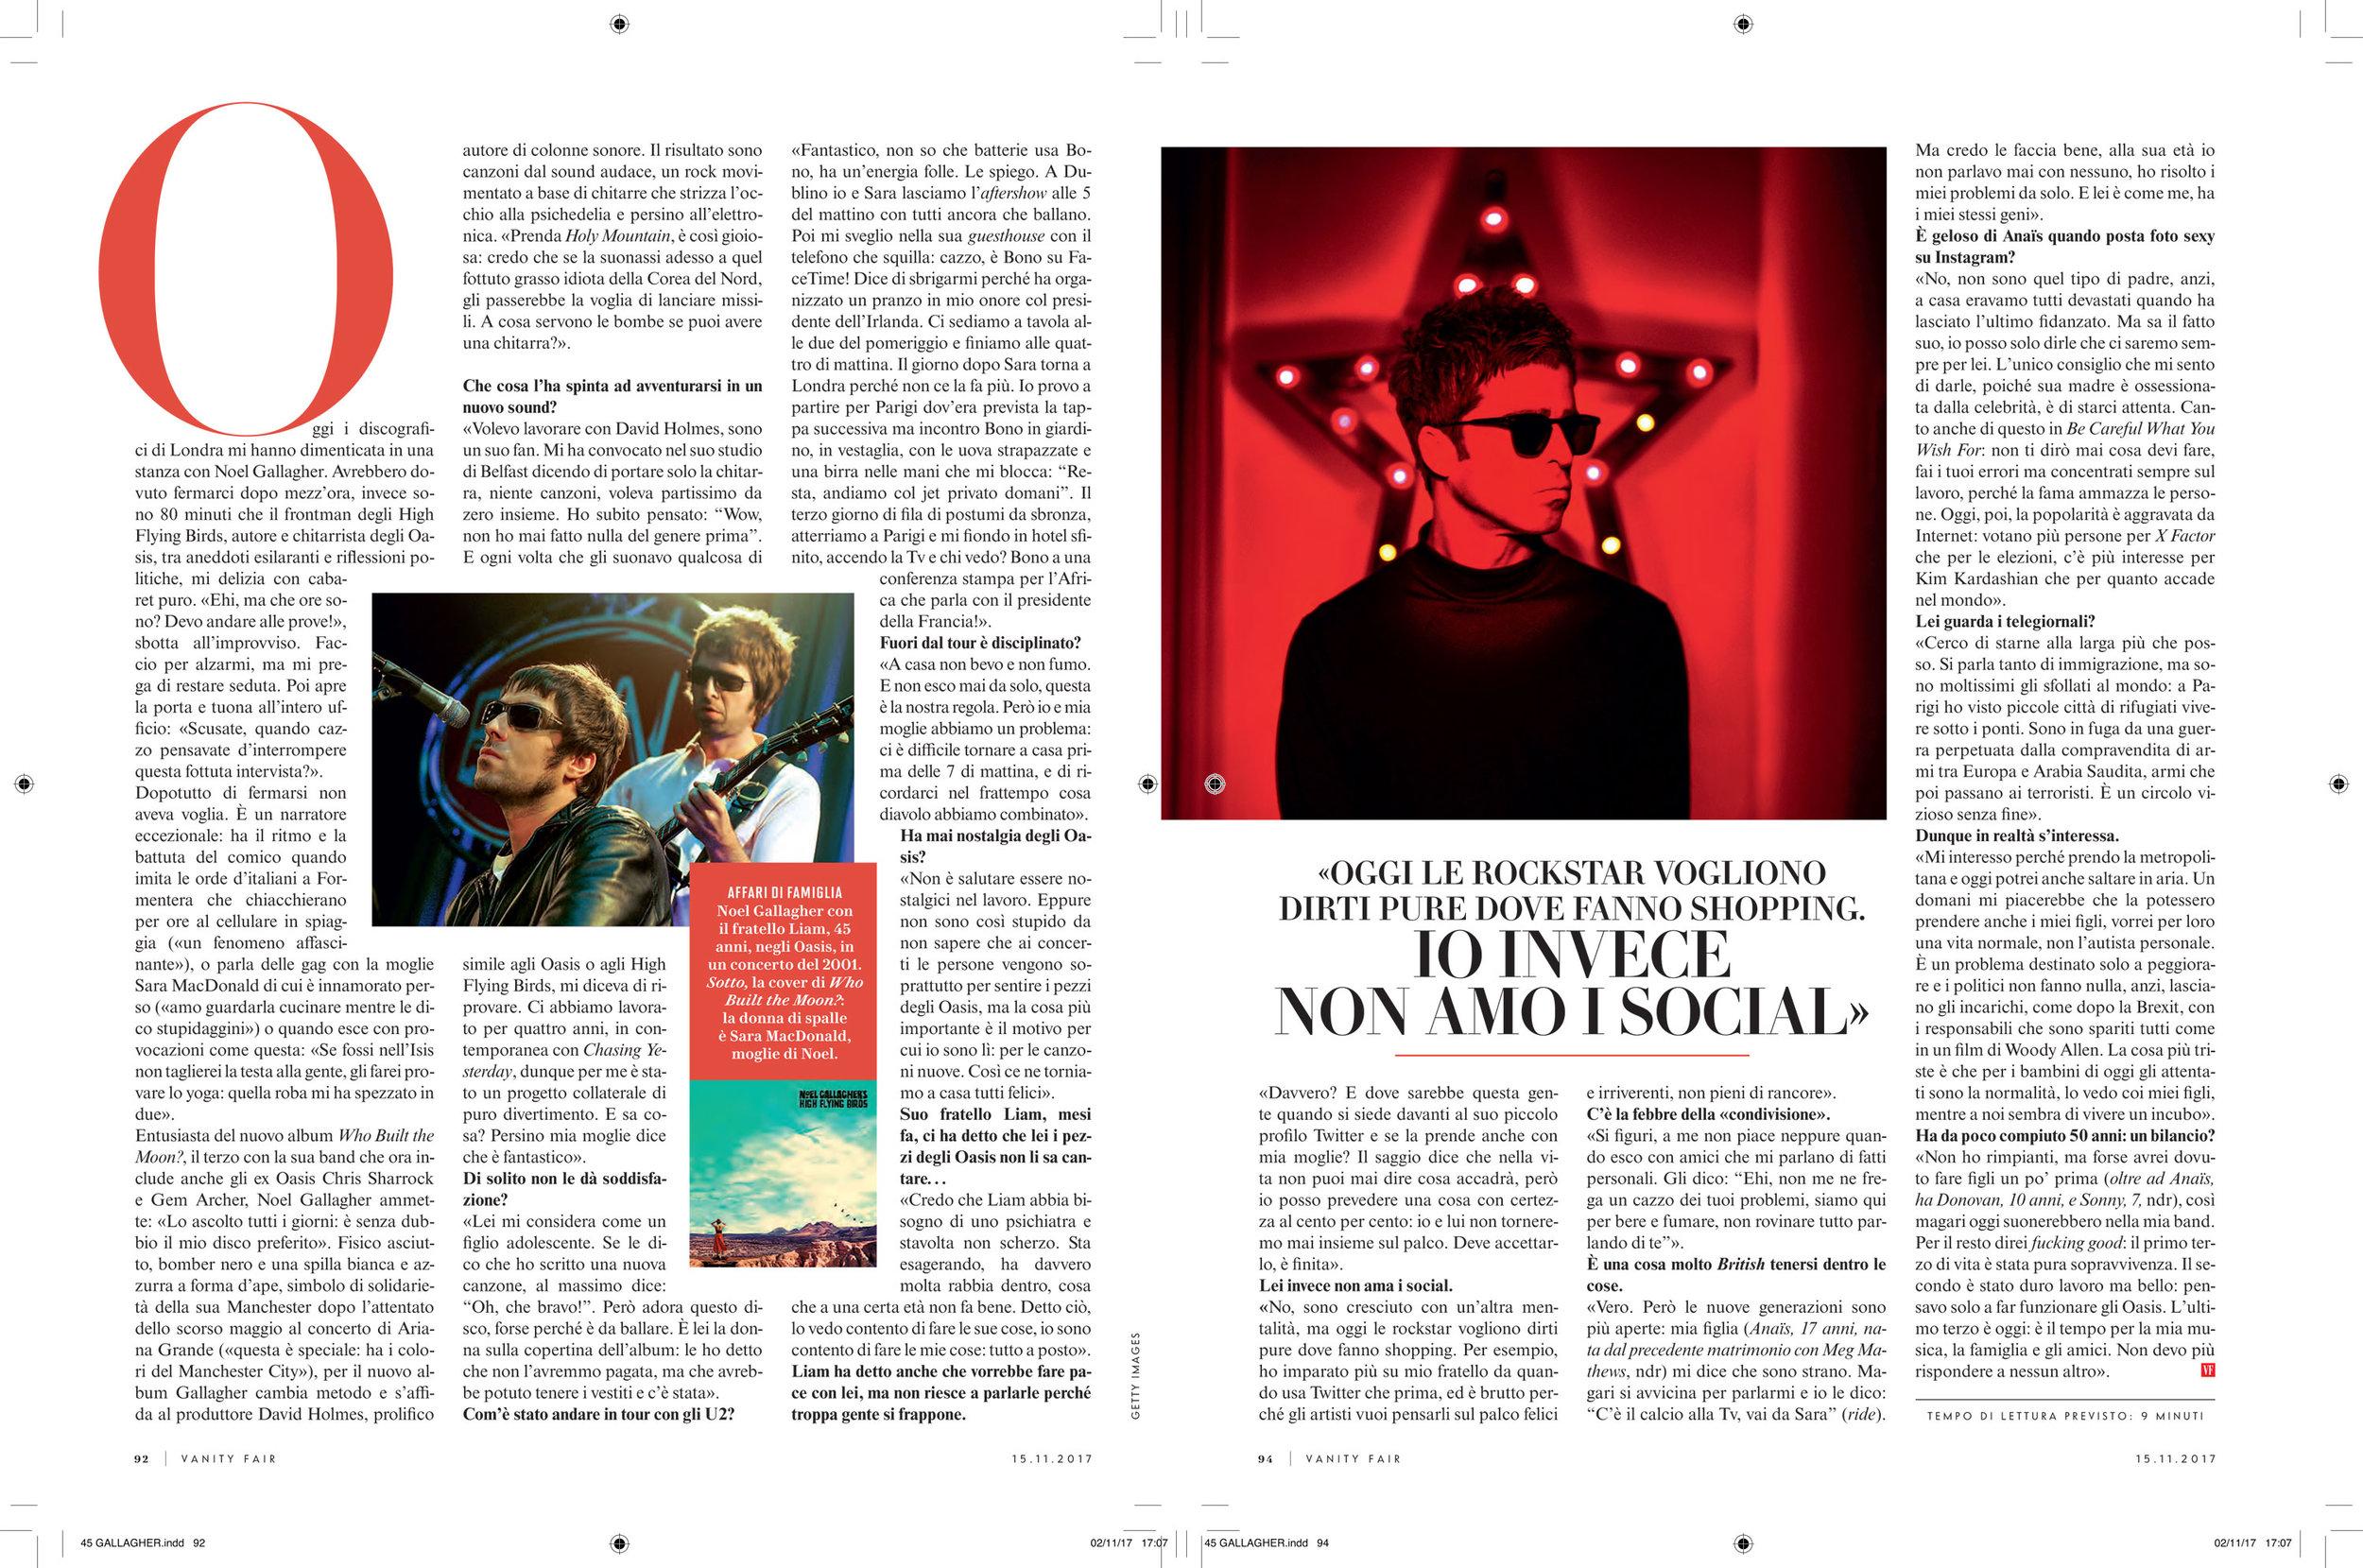 Vanity Fair: Noel Gallagher interview